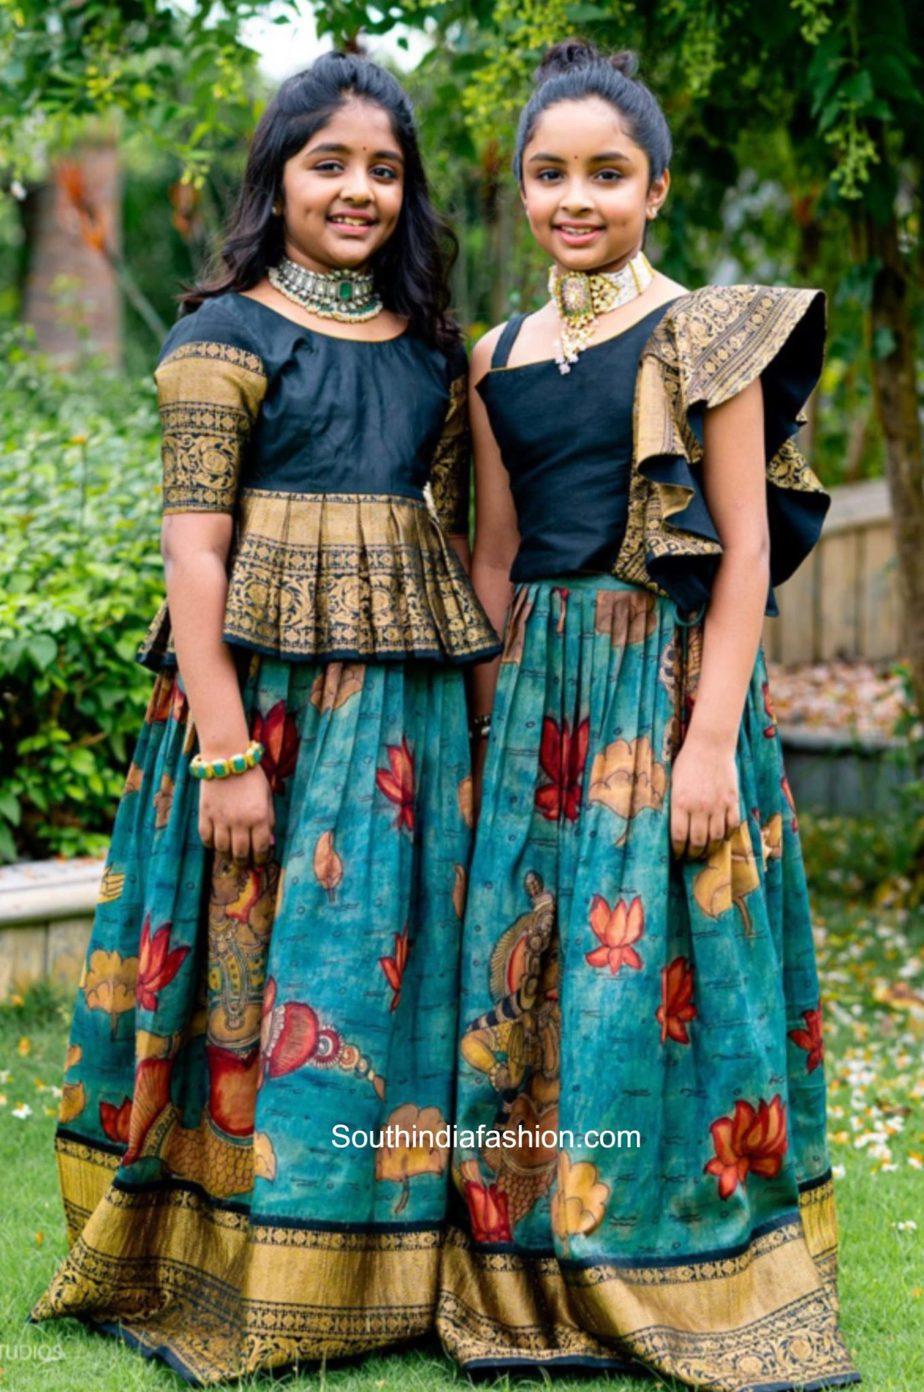 ariaana manchu and viviana manchu in kalmakari lehengas